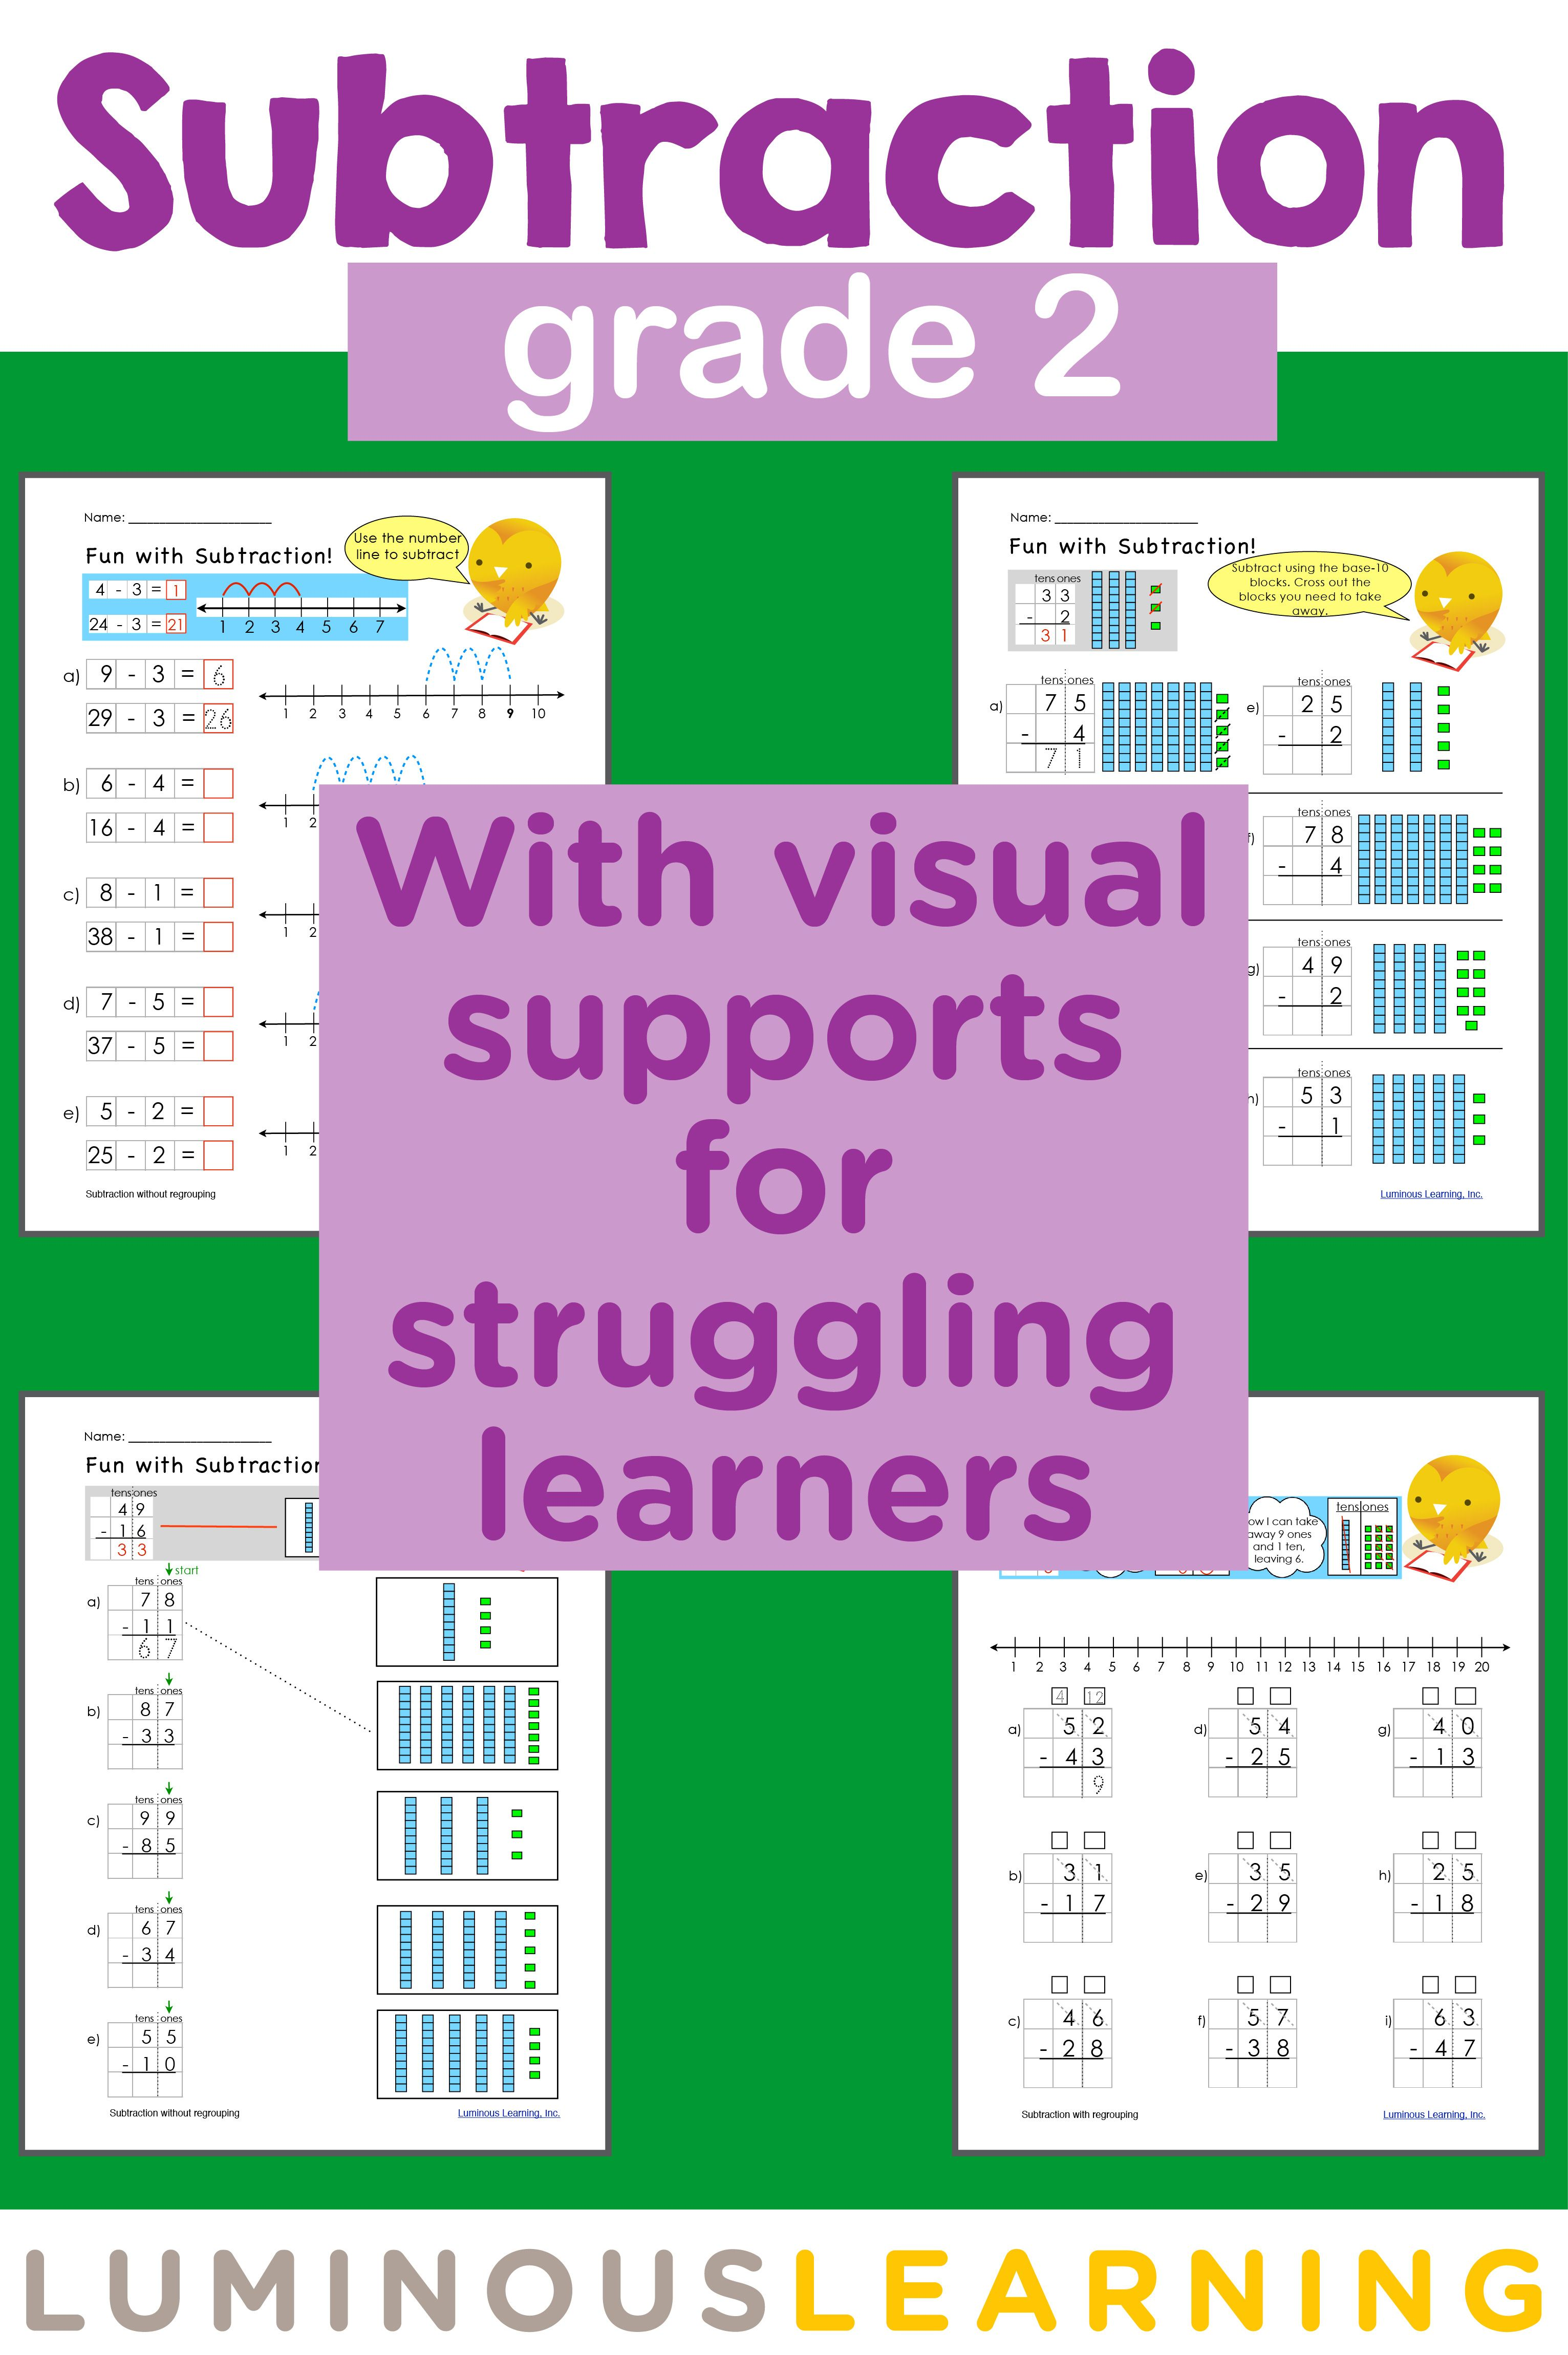 Grade 2 Subtraction Printable Workbook | Pinterest | Visual aids ...